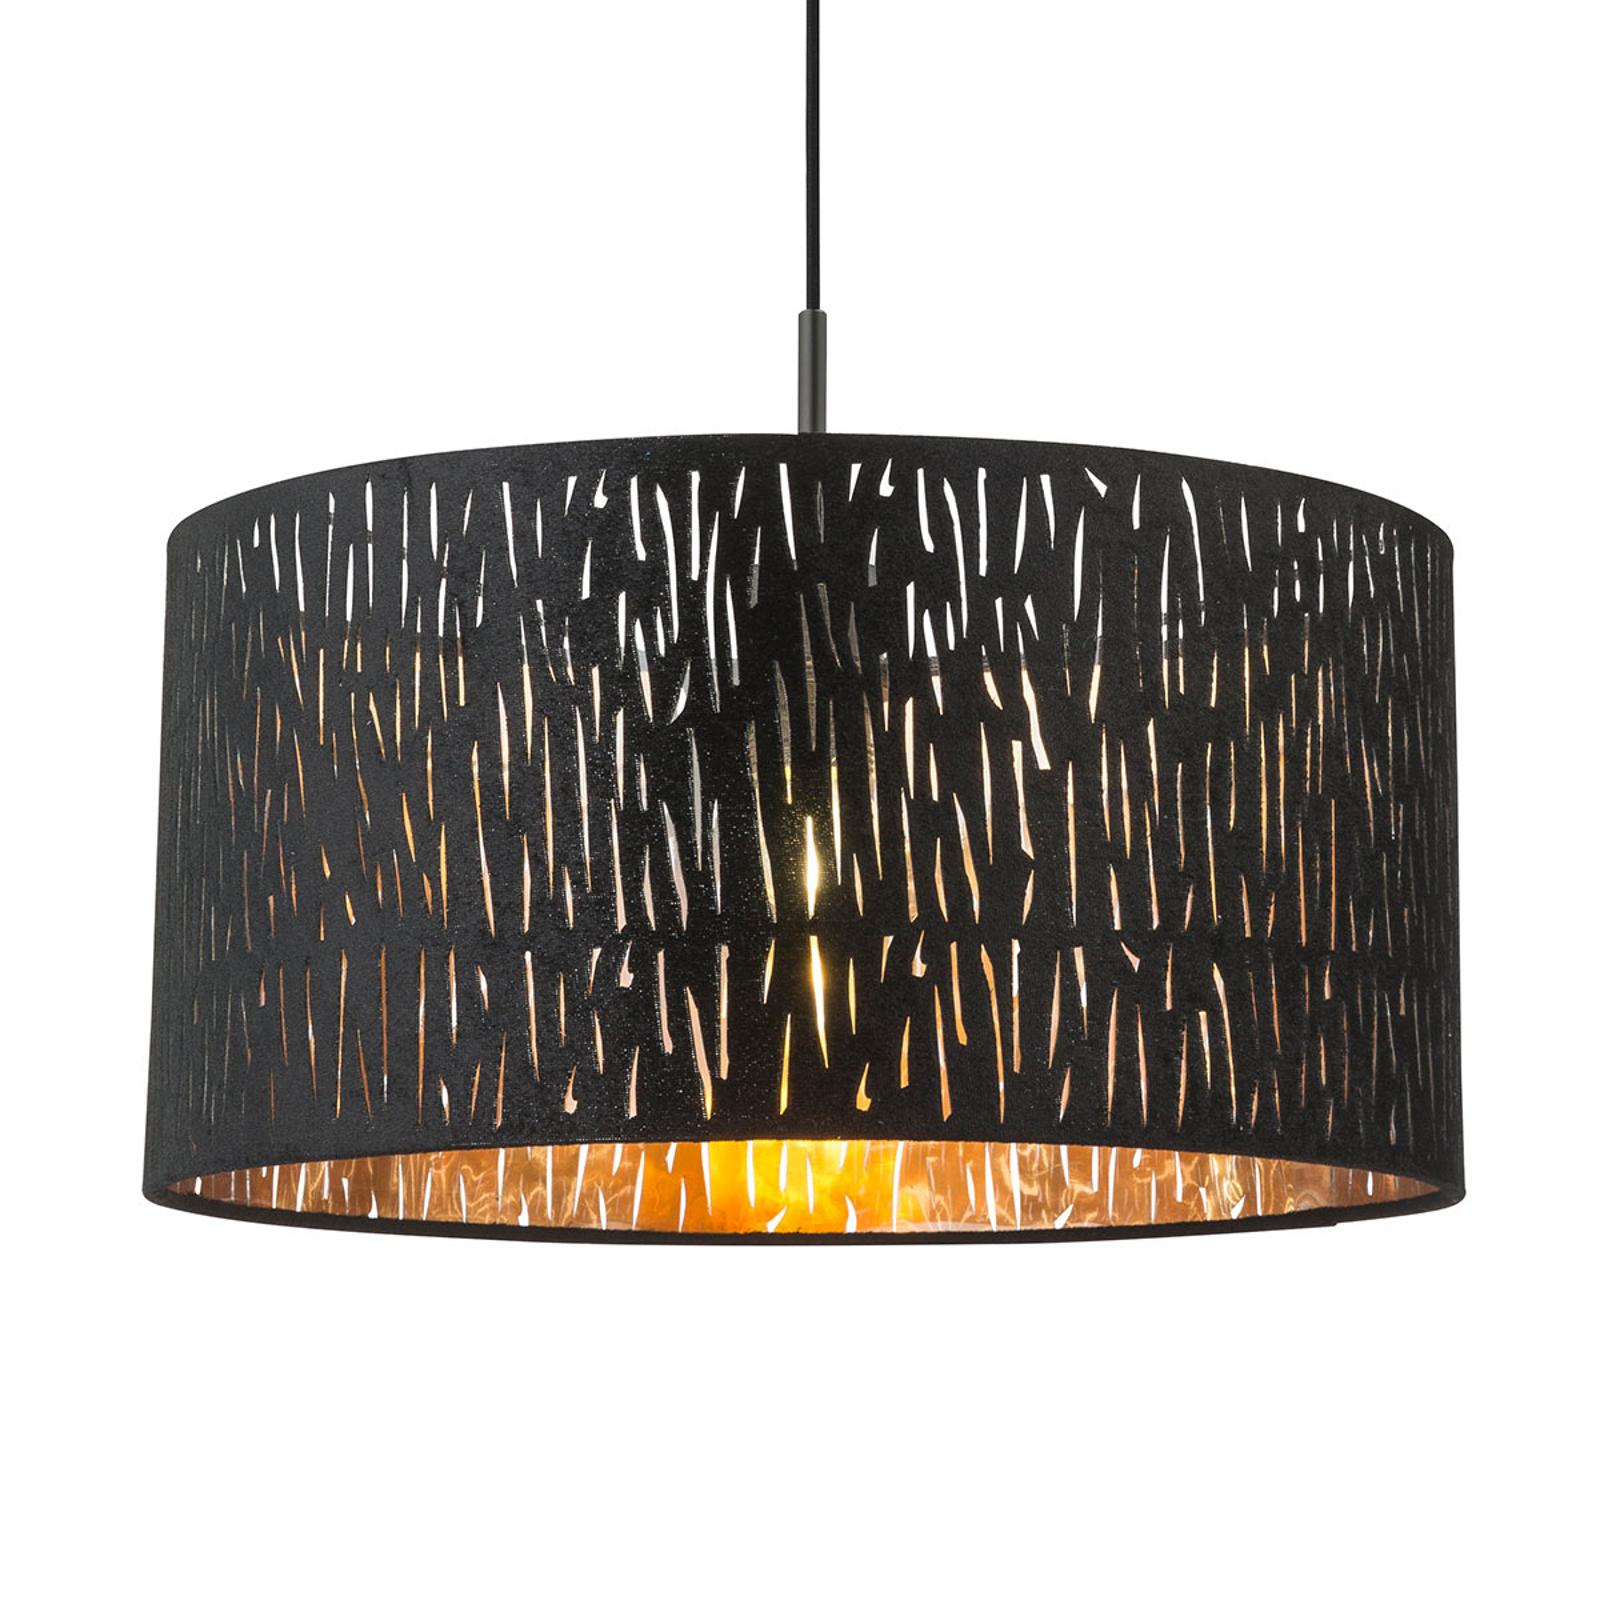 Hanglamp Tuxon, rond, 40 cm